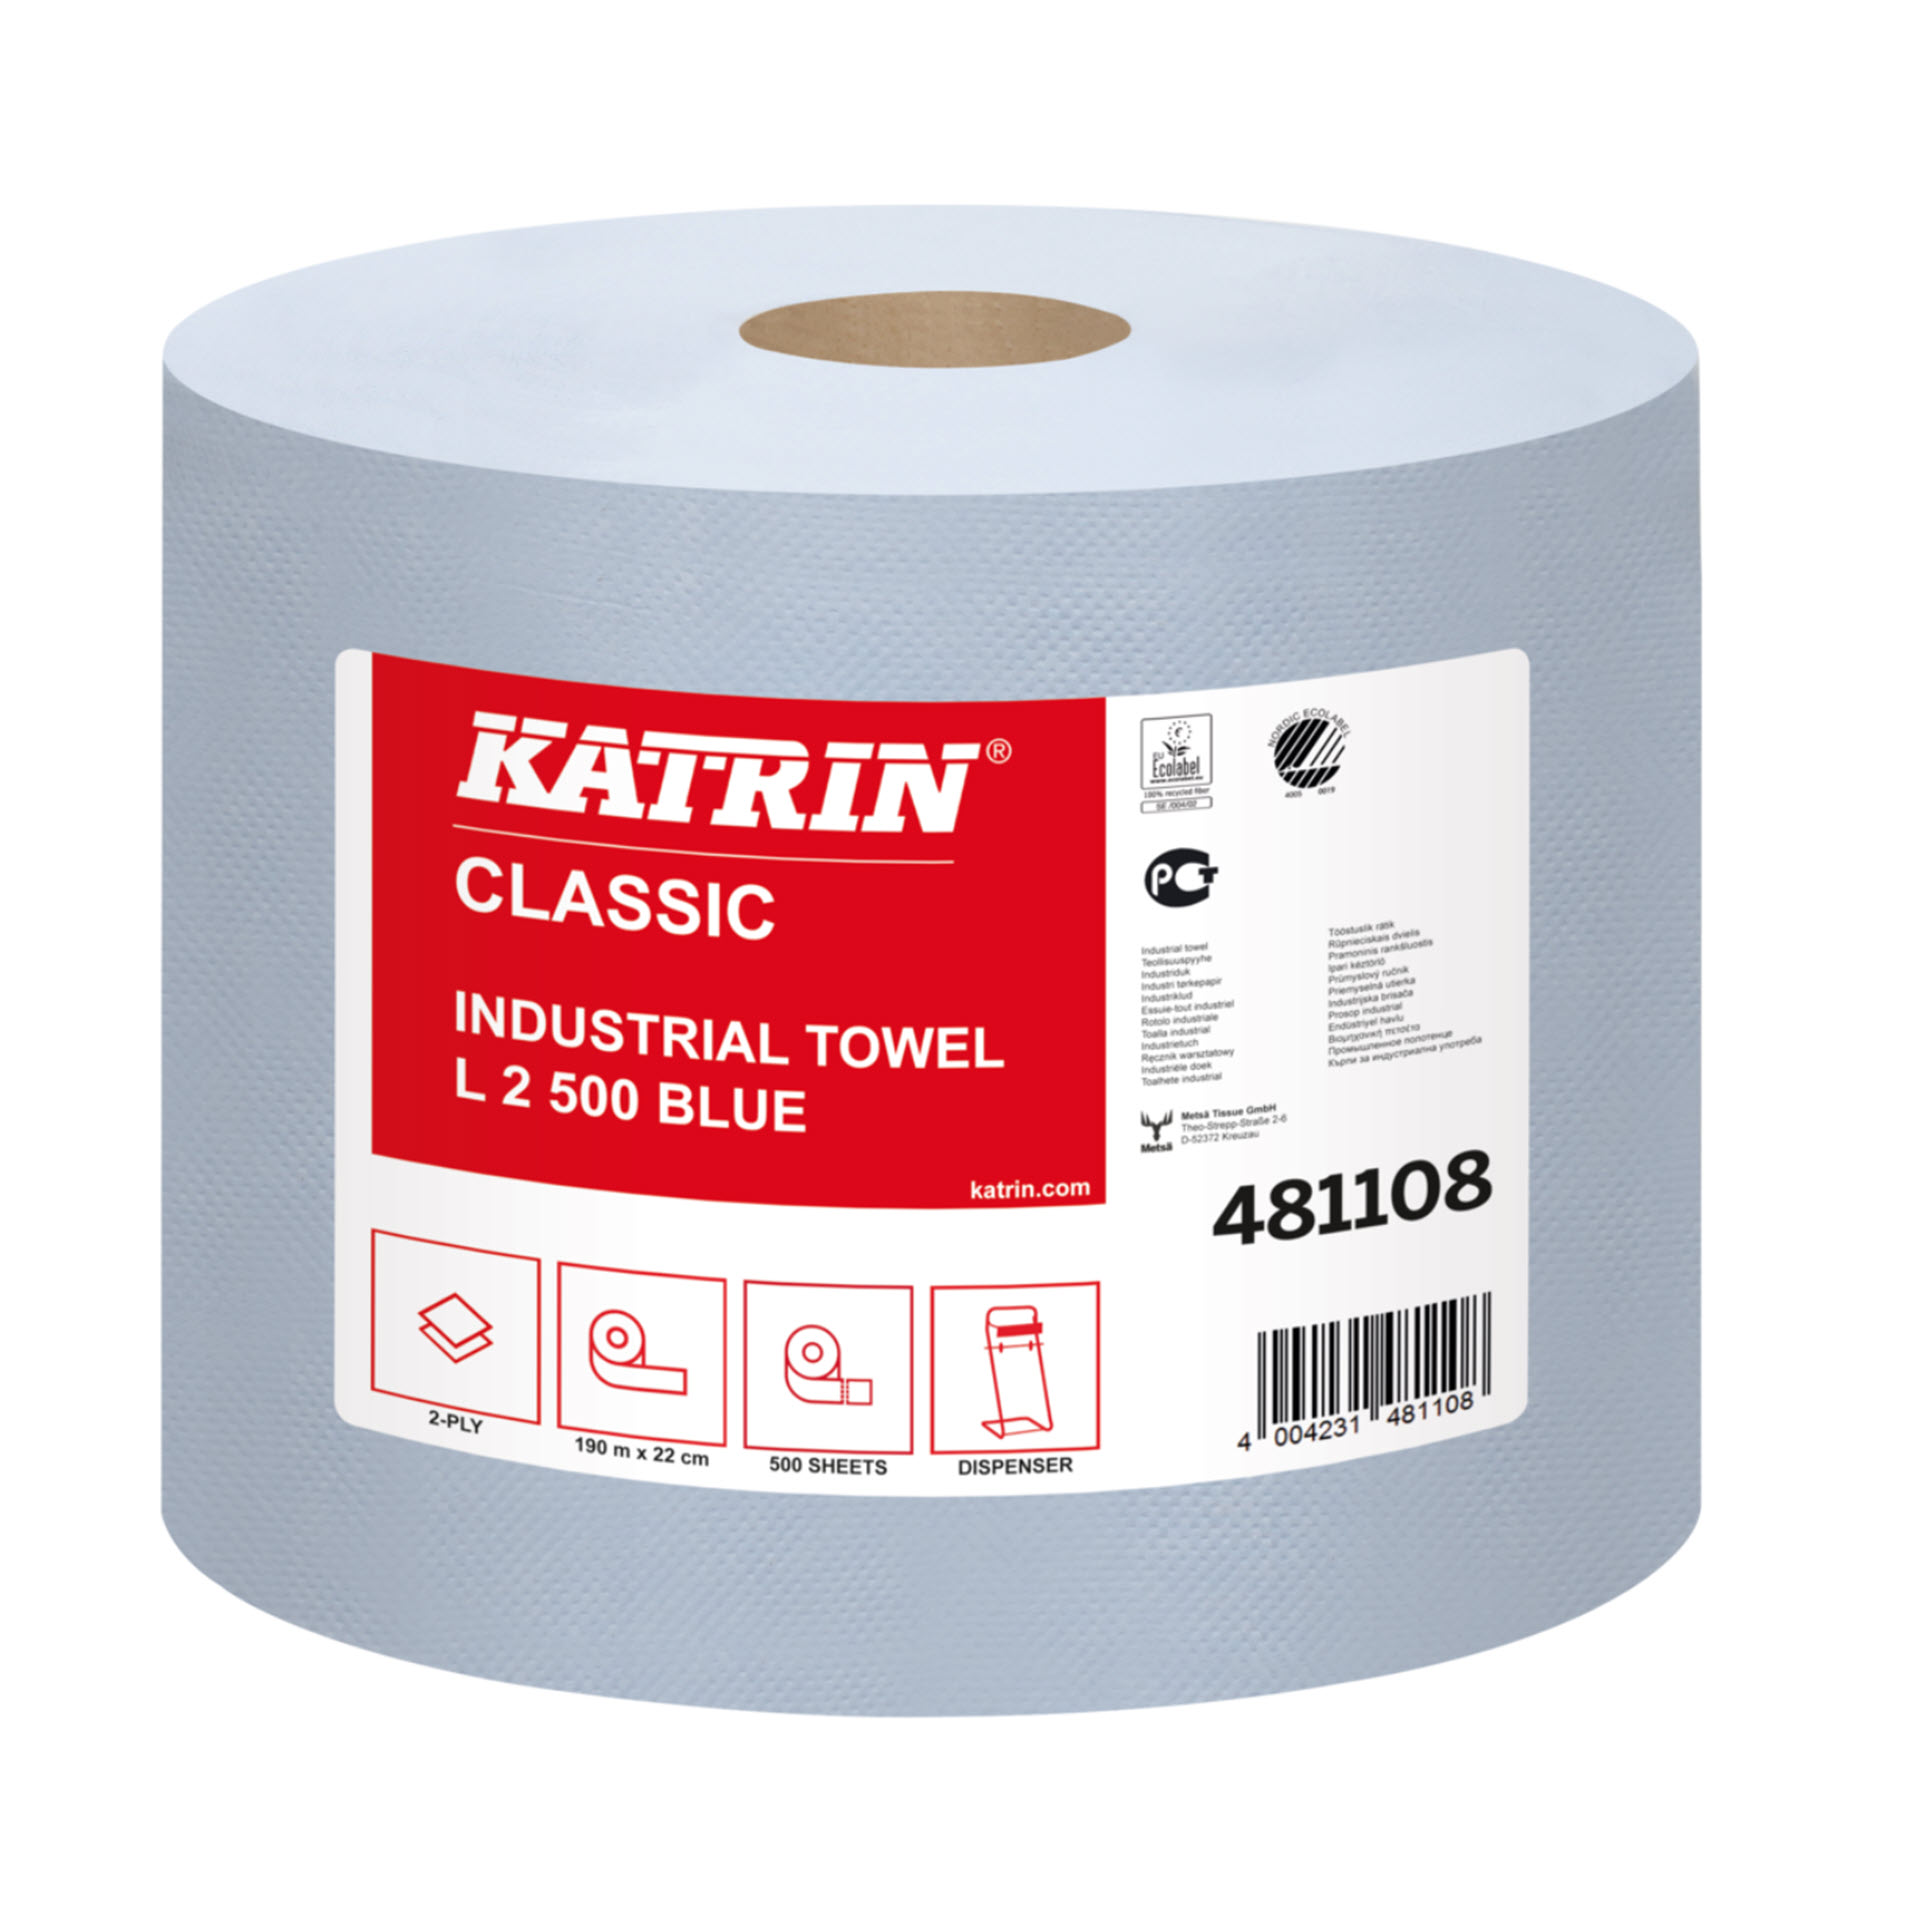 Katrin Classic Industrial Towel L2 Blue laminated - 481108 - Putztuch / Tissue-Wischtuch